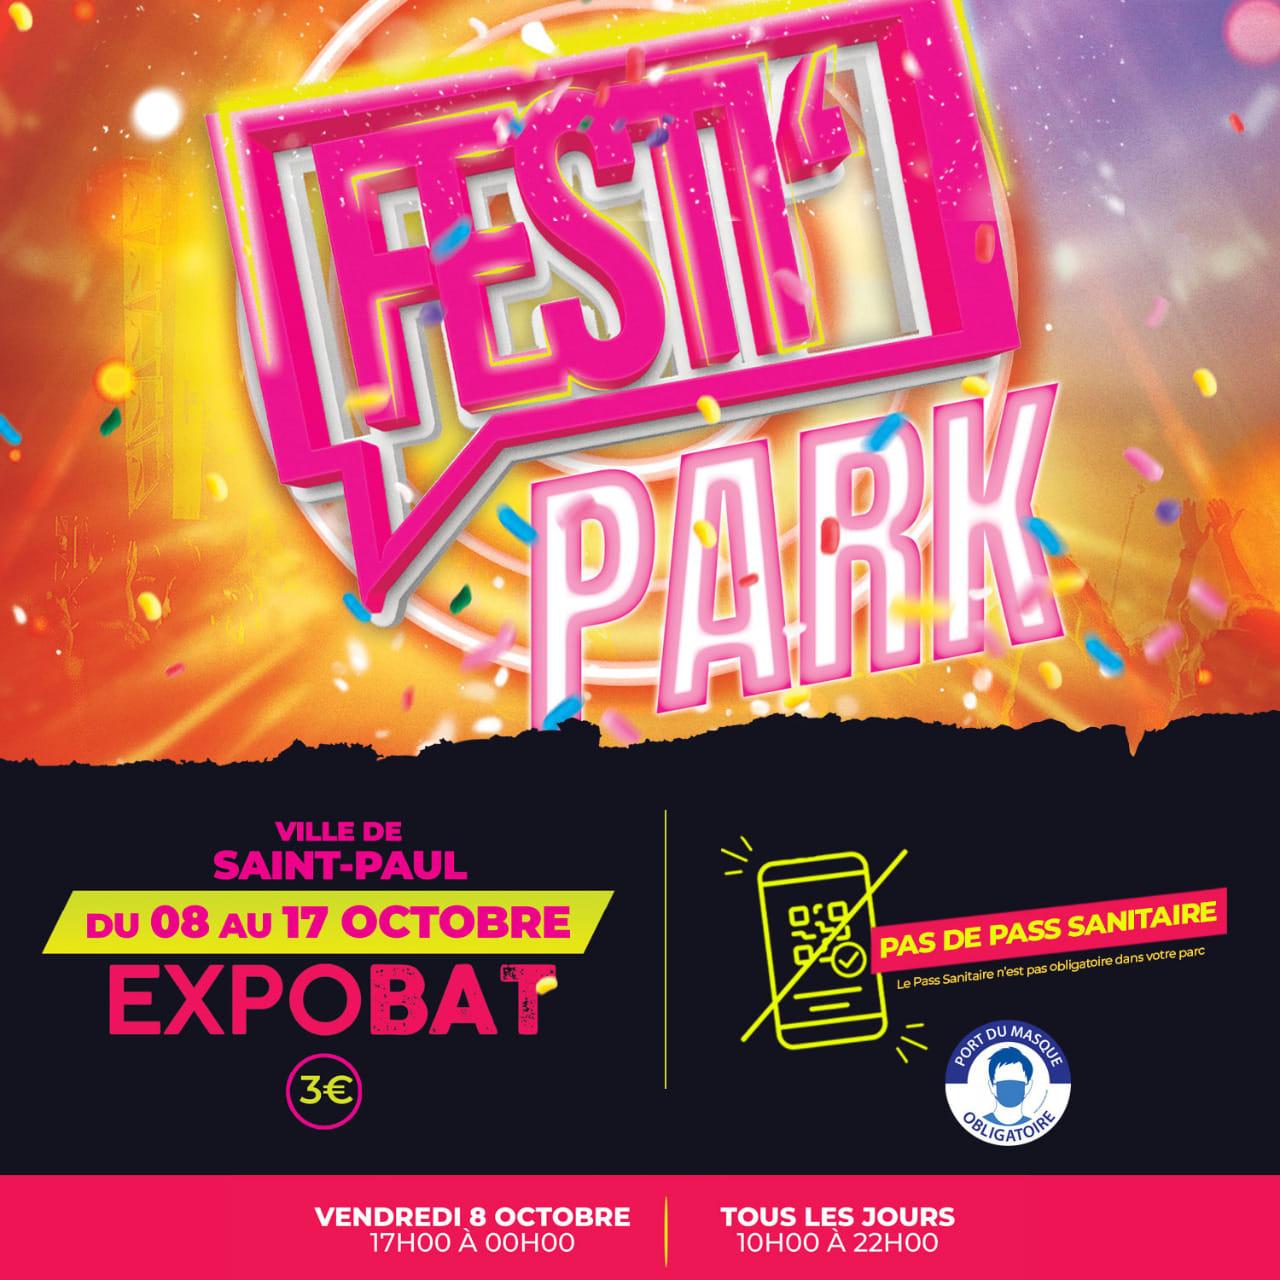 FESTI'PARK